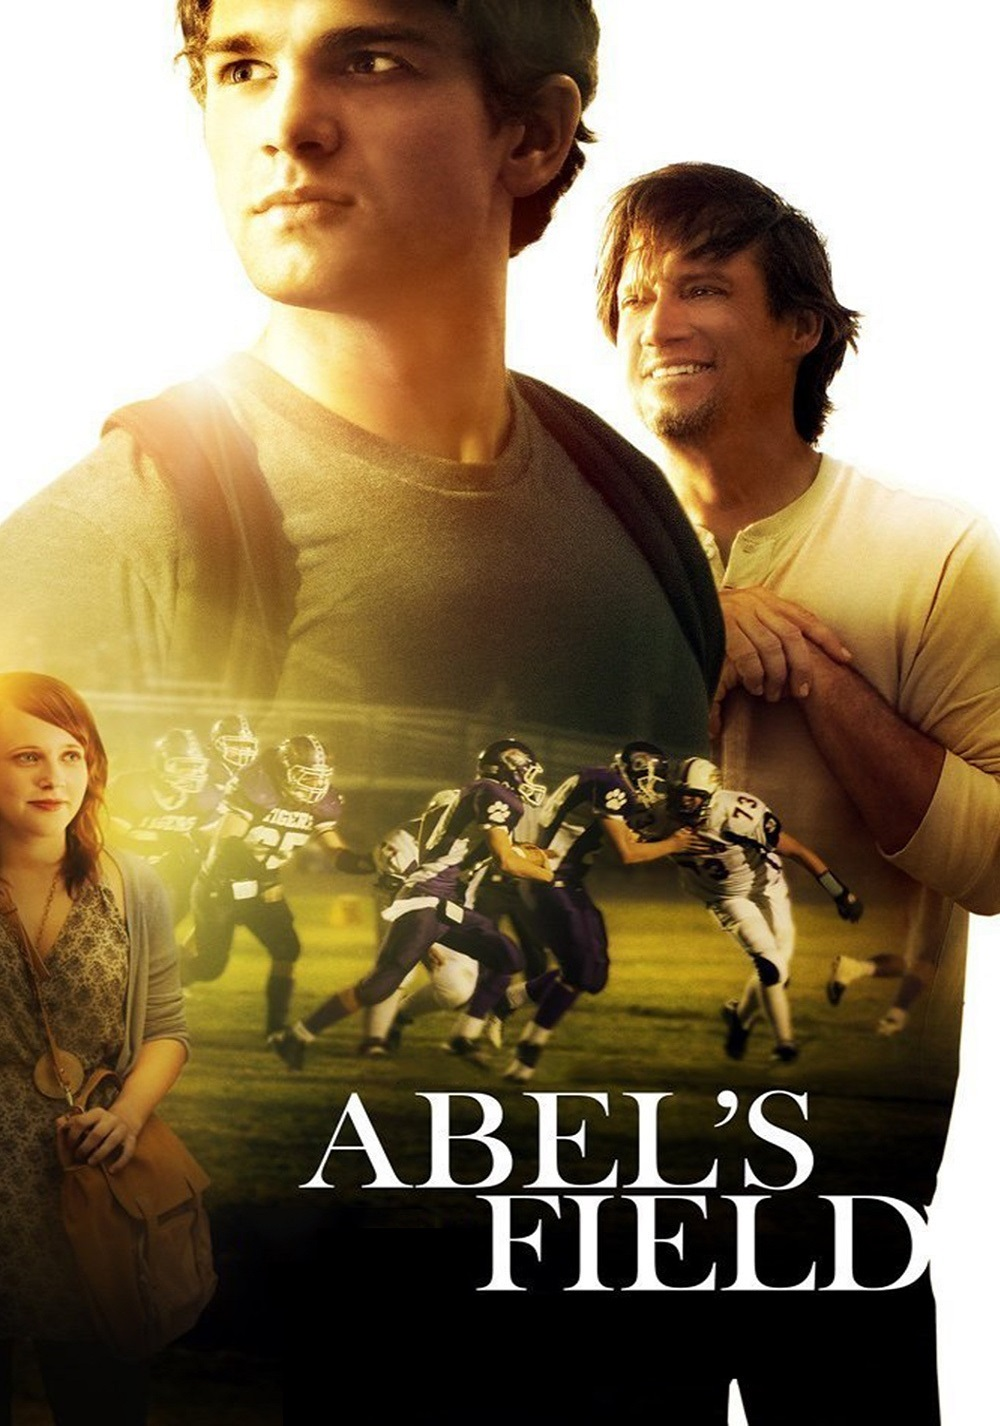 abels field 2 poster.jpg